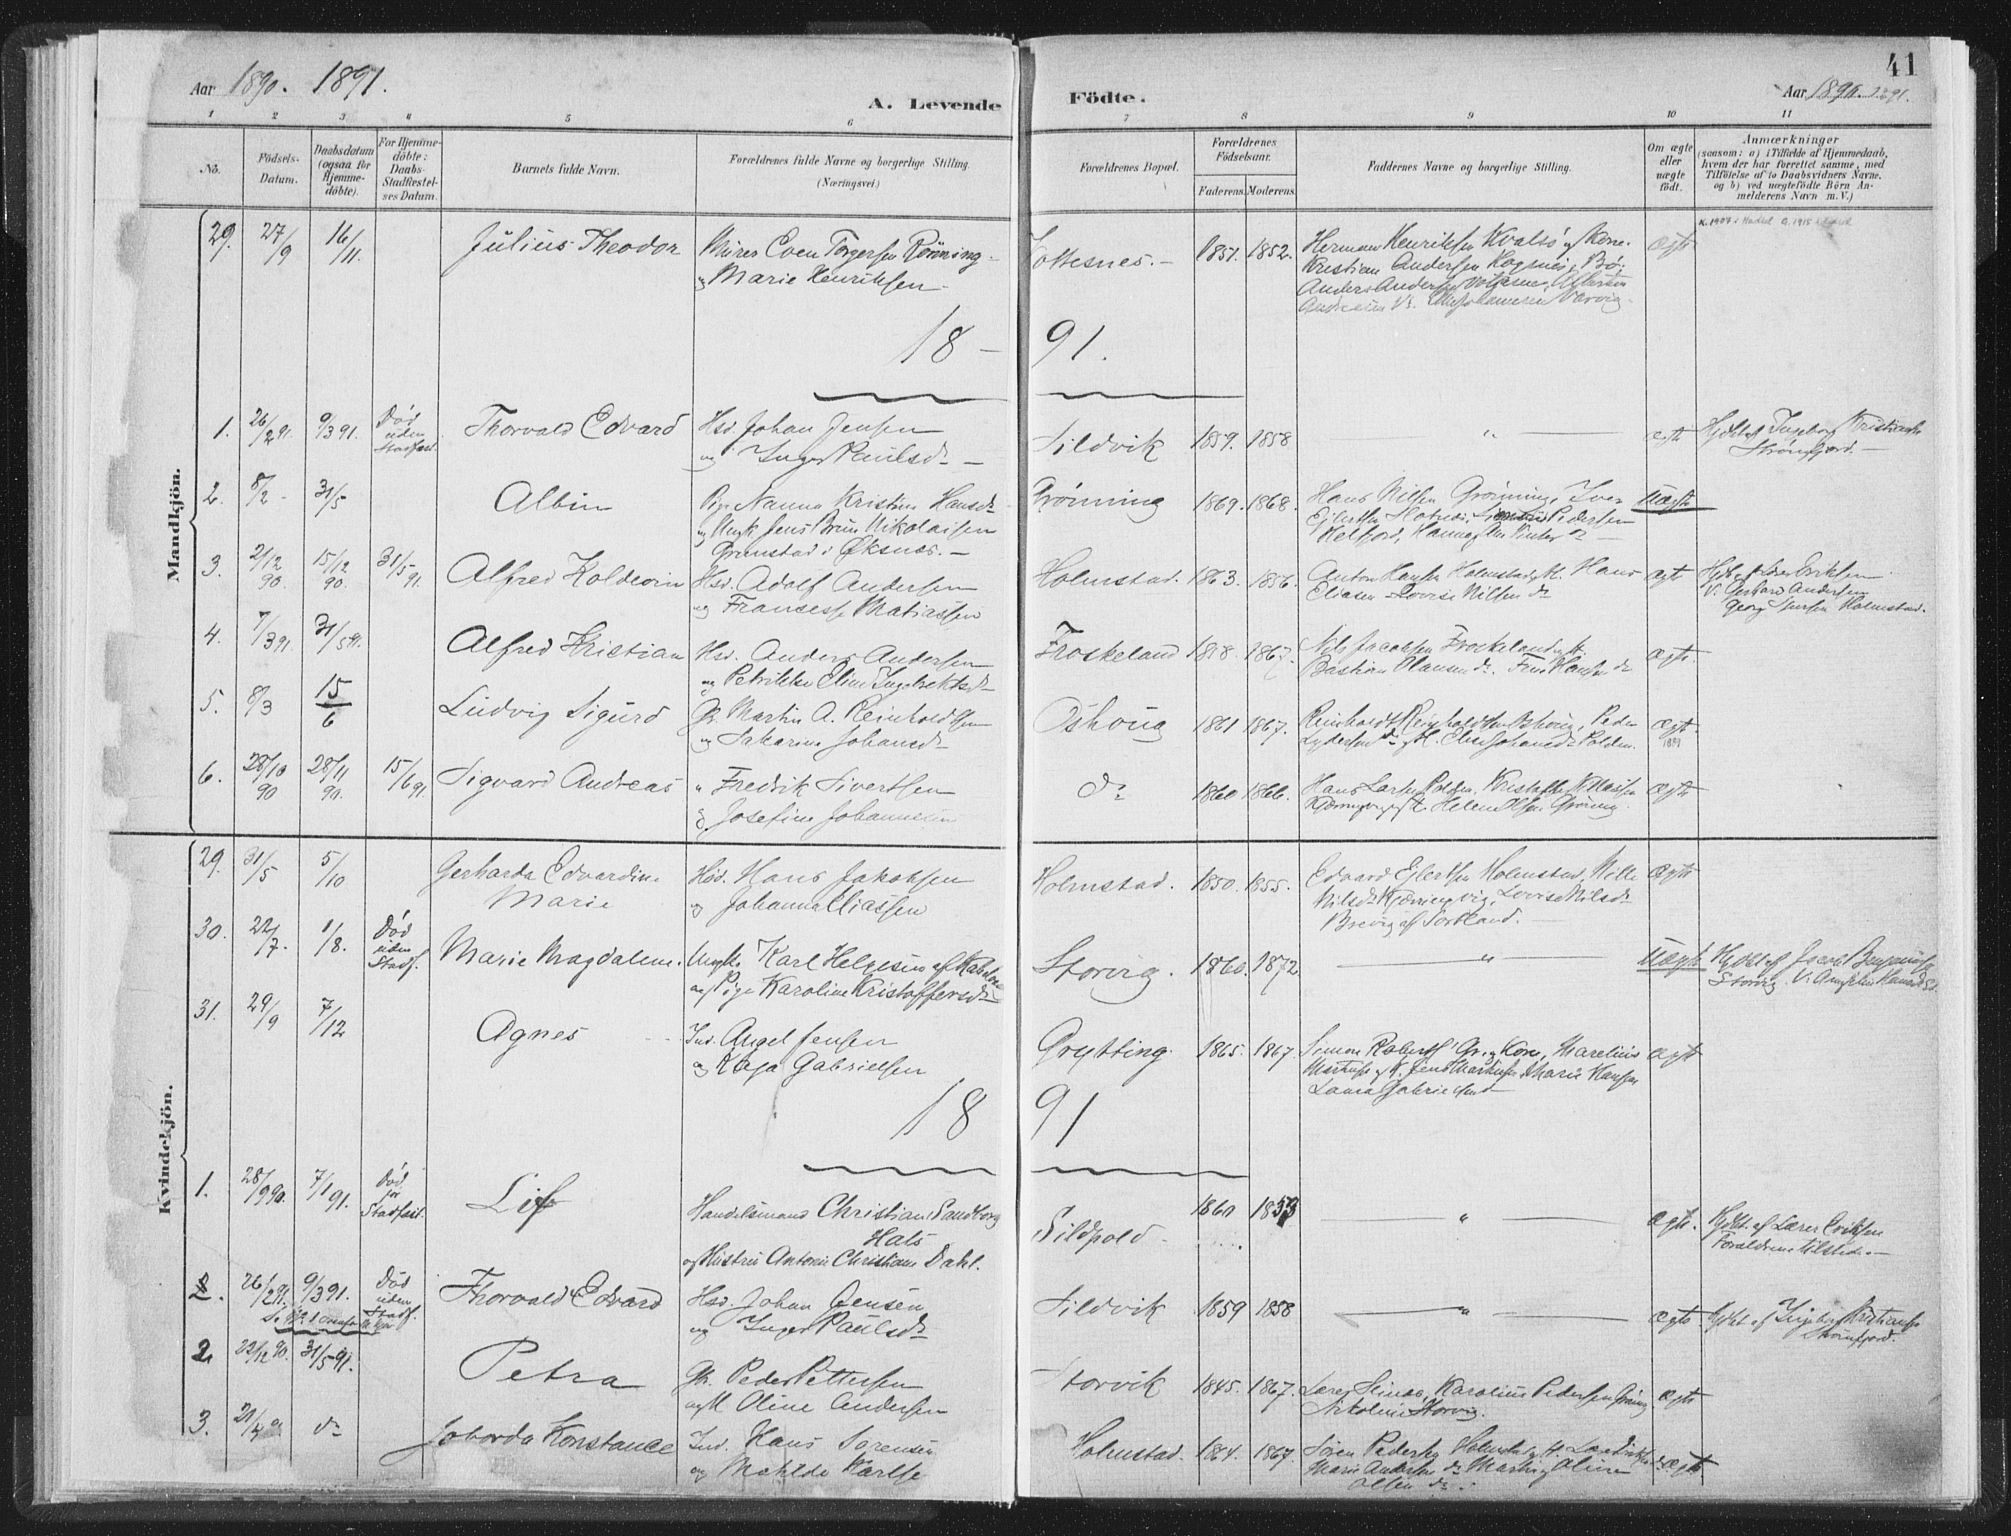 SAT, Ministerialprotokoller, klokkerbøker og fødselsregistre - Nordland, 890/L1286: Ministerialbok nr. 890A01, 1882-1902, s. 41